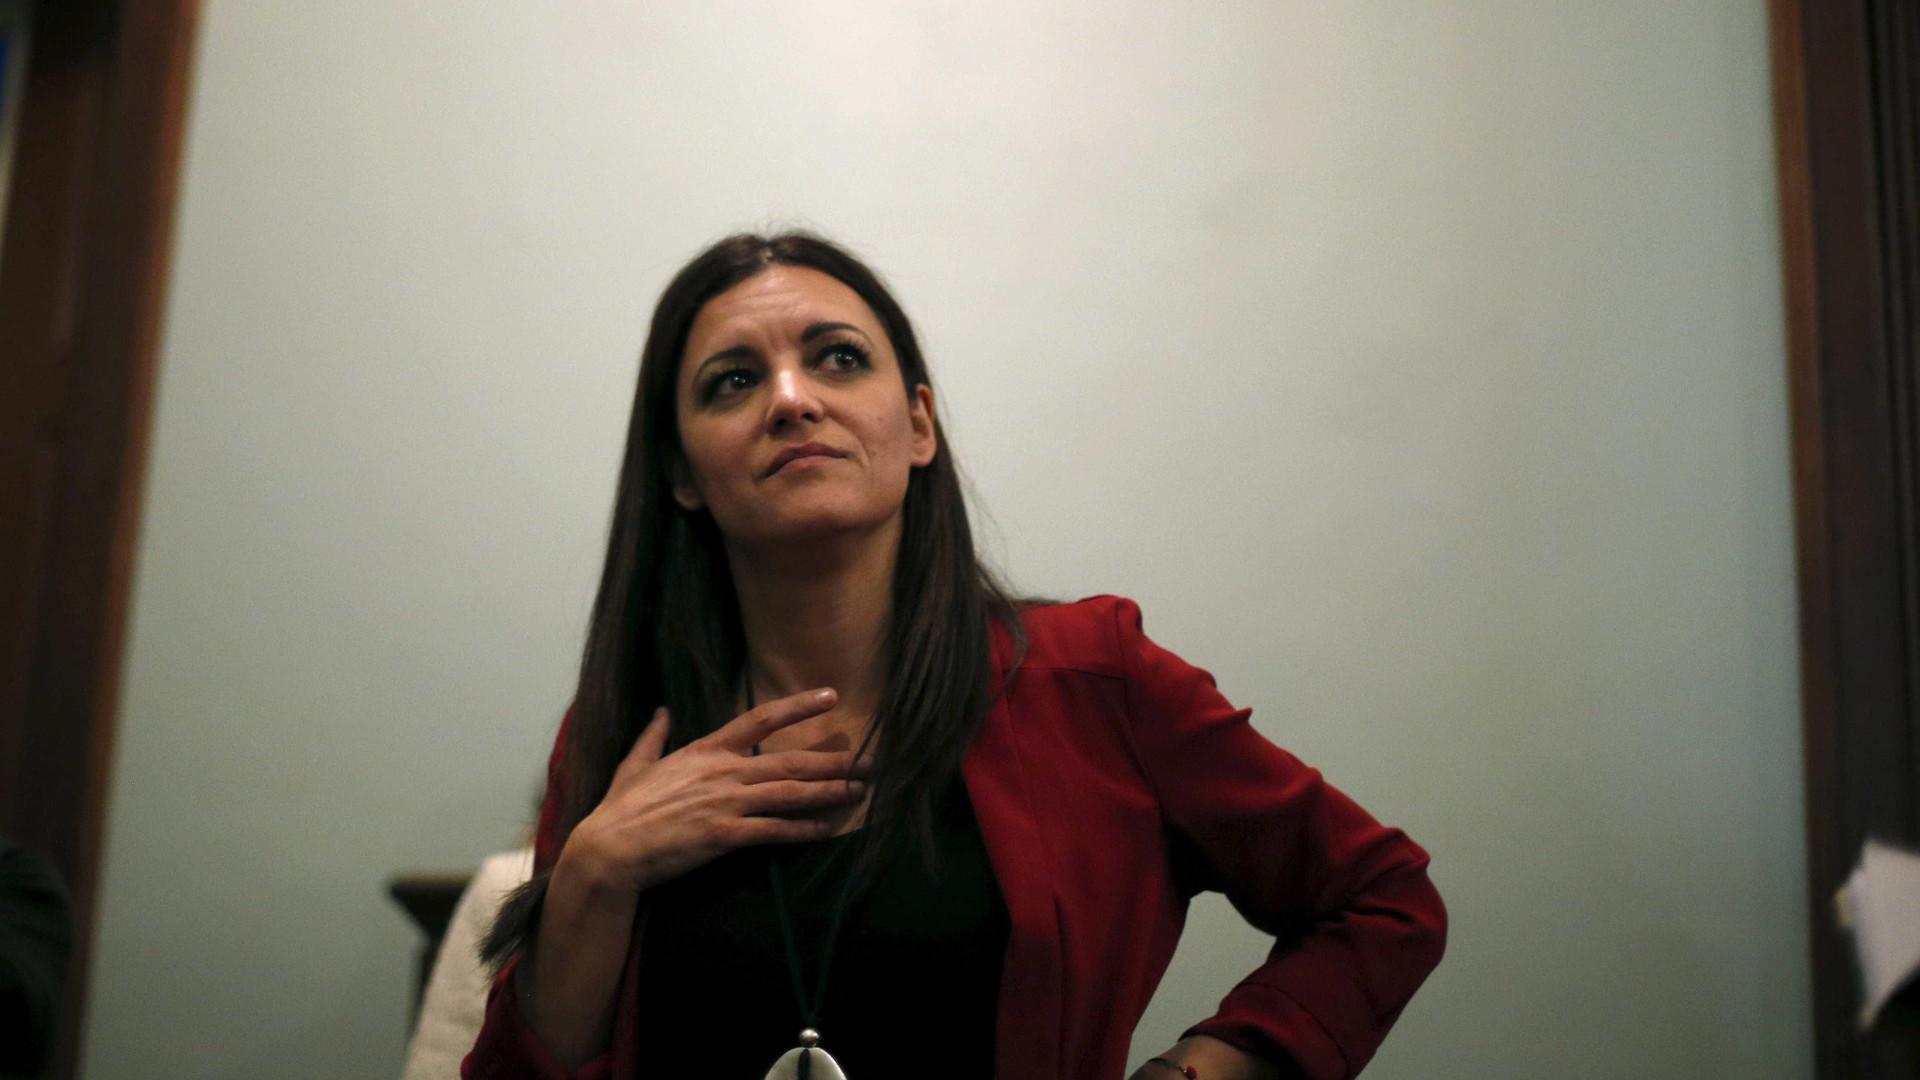 Marisa Matias publica vídeo a apoiar Mélenchon